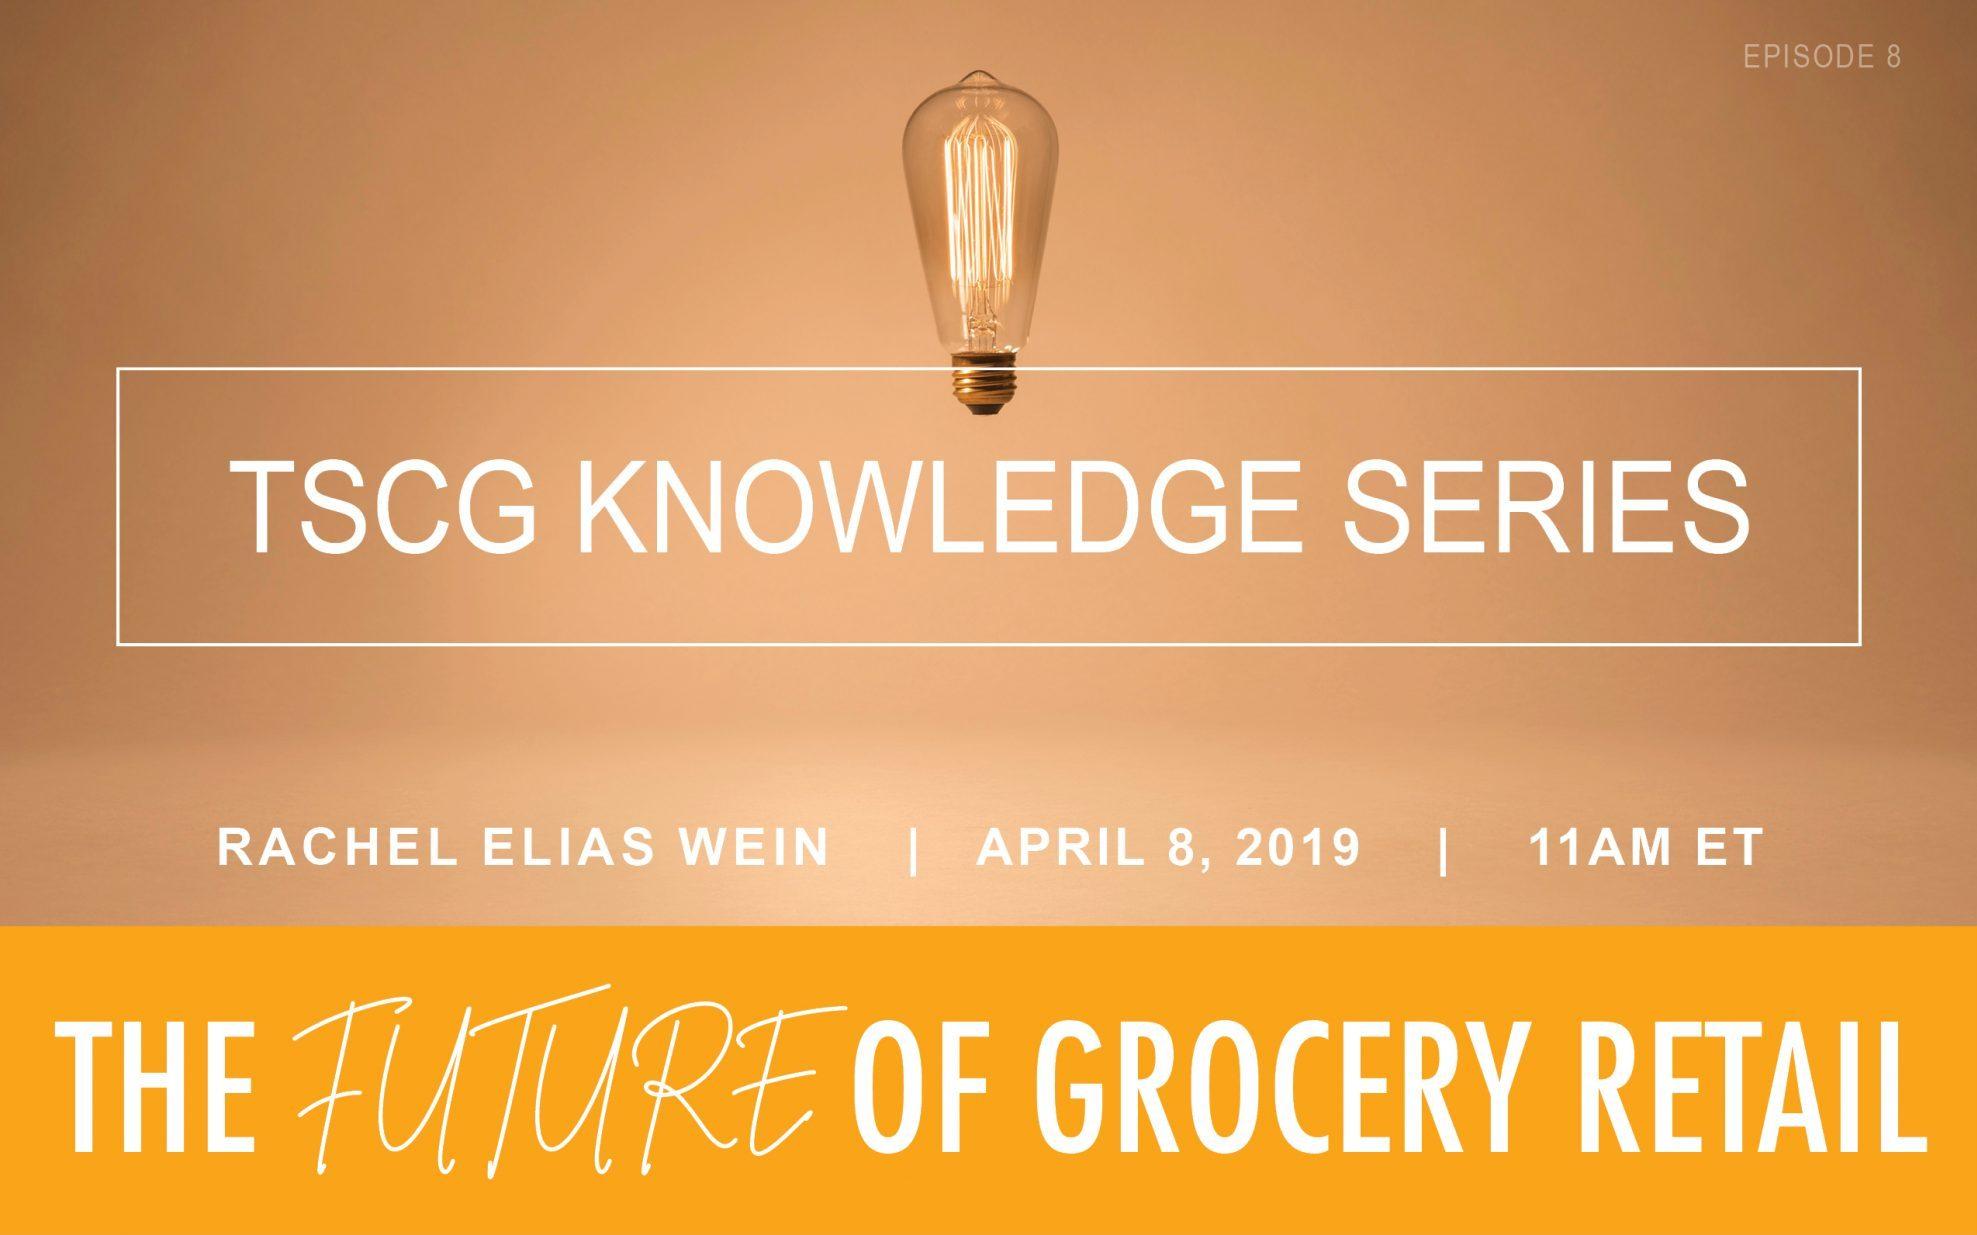 TSCG Knowledge Series